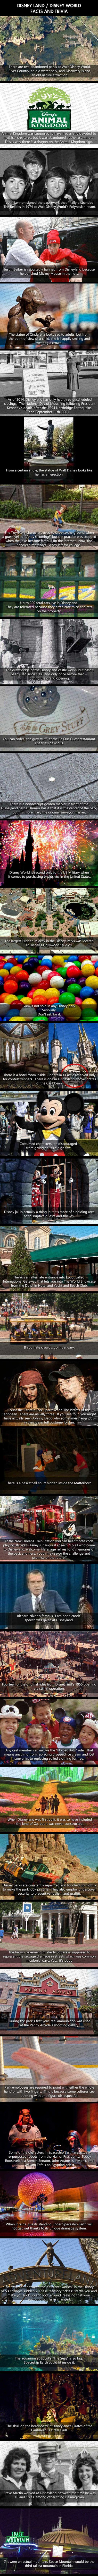 cool-Disney-World-River-parks